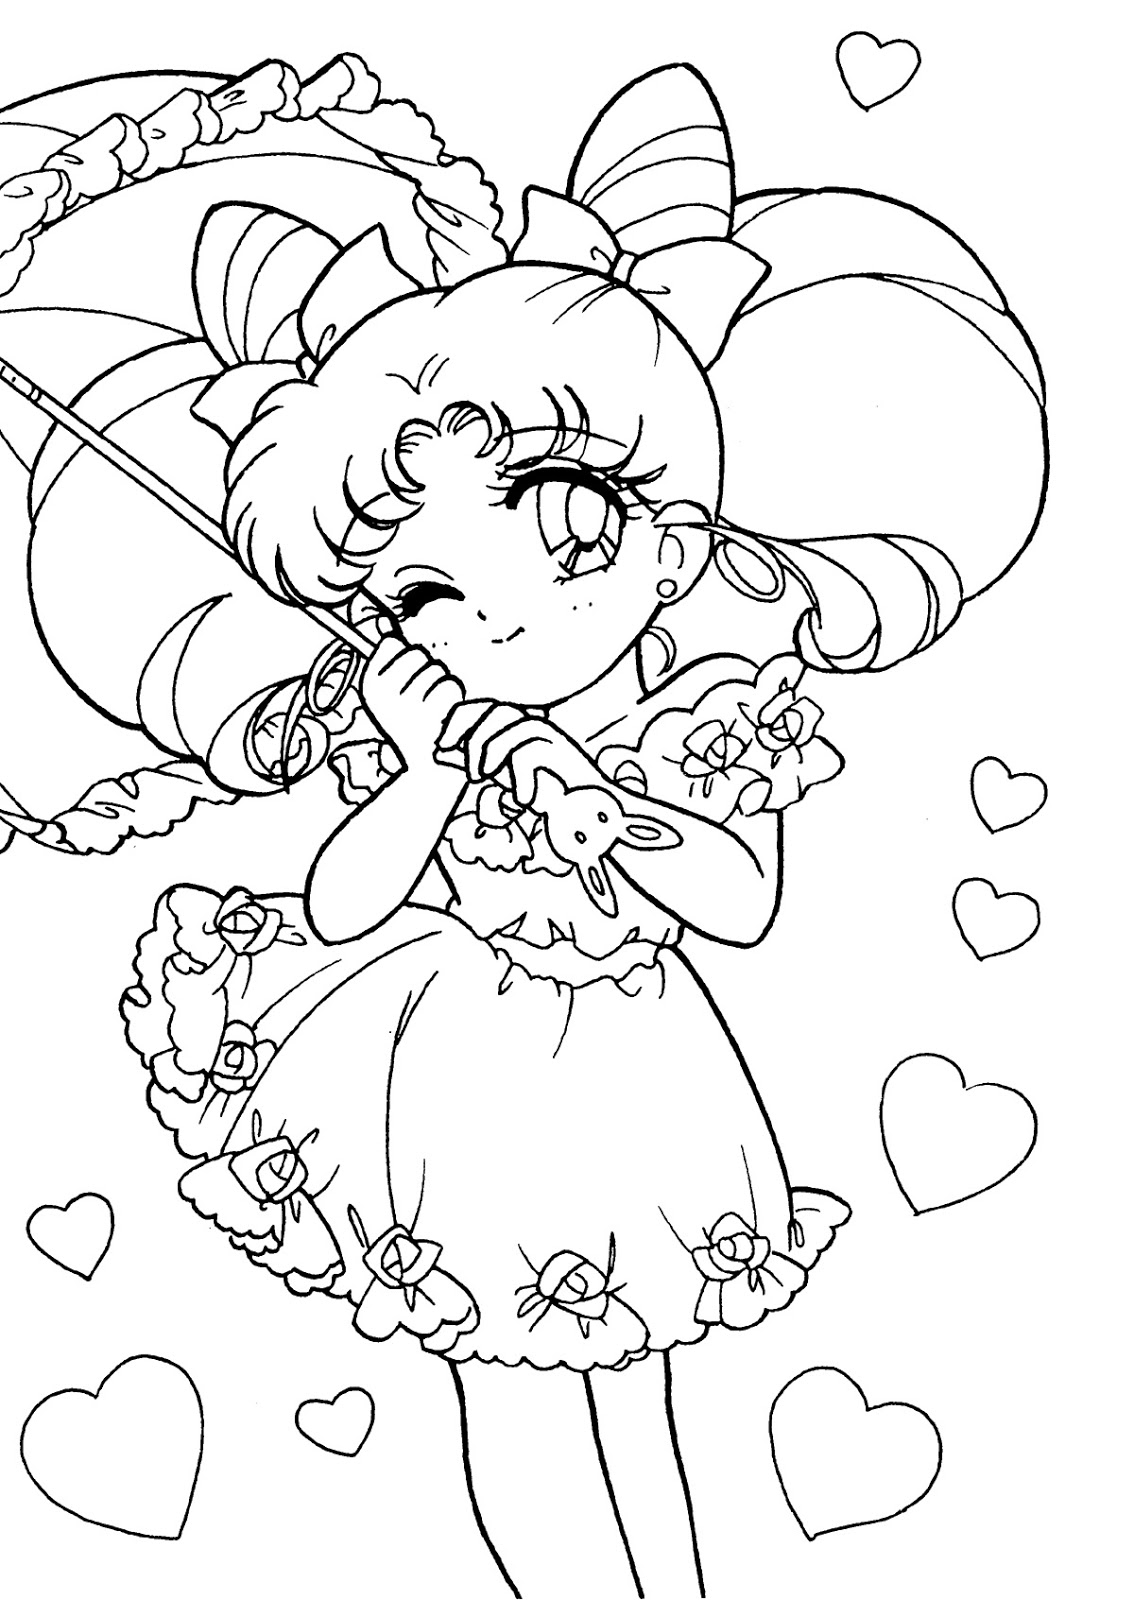 Dibujos Para Colorear De Sailor Moon Sailor Moon Spain